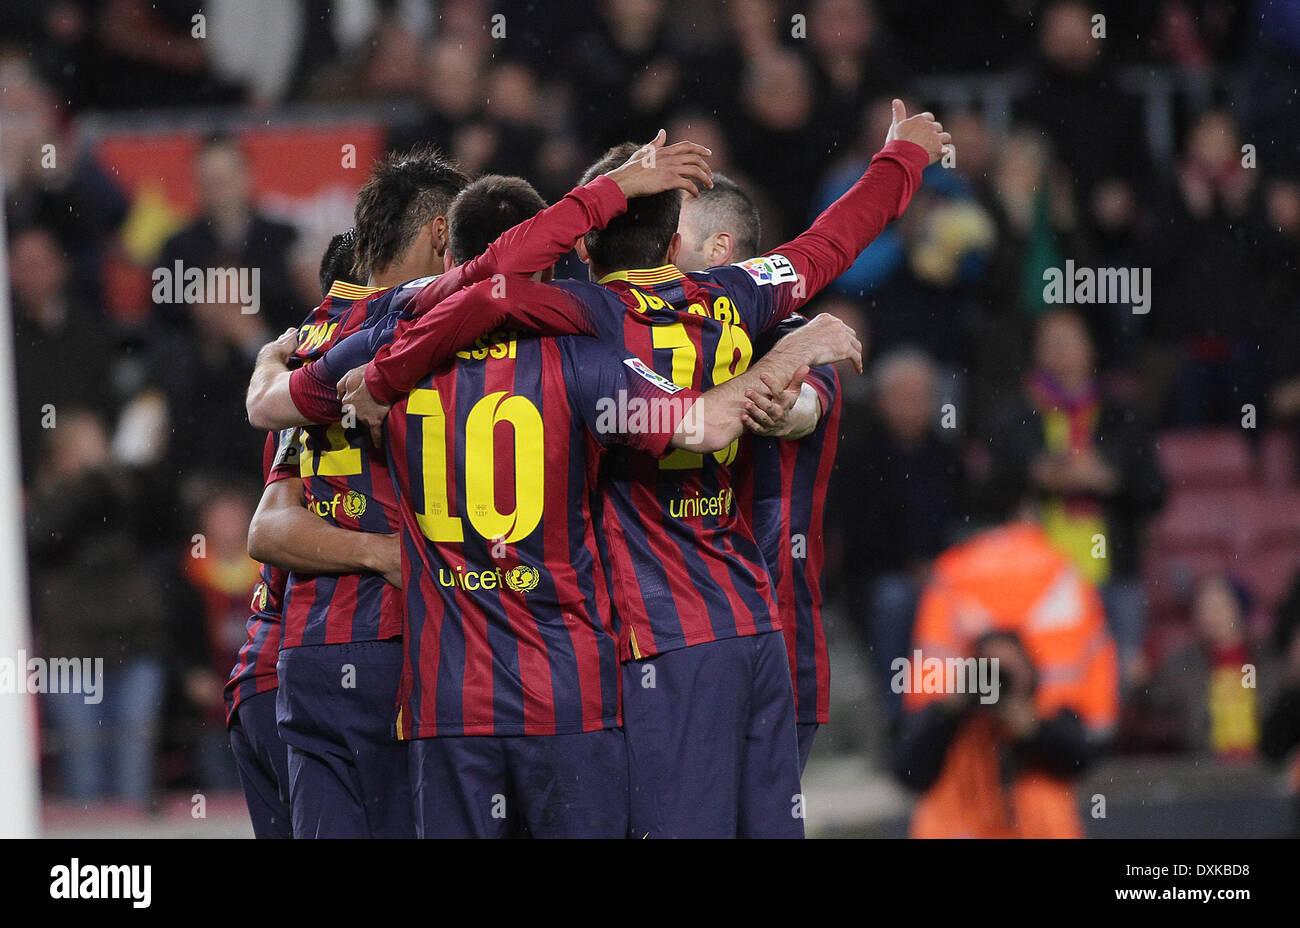 26.03.2014  Barcelona, Neymar celebring his first goal during the Liga BBVA game between Barcelona and Celta Vigo from Camp Nou - Stock Image